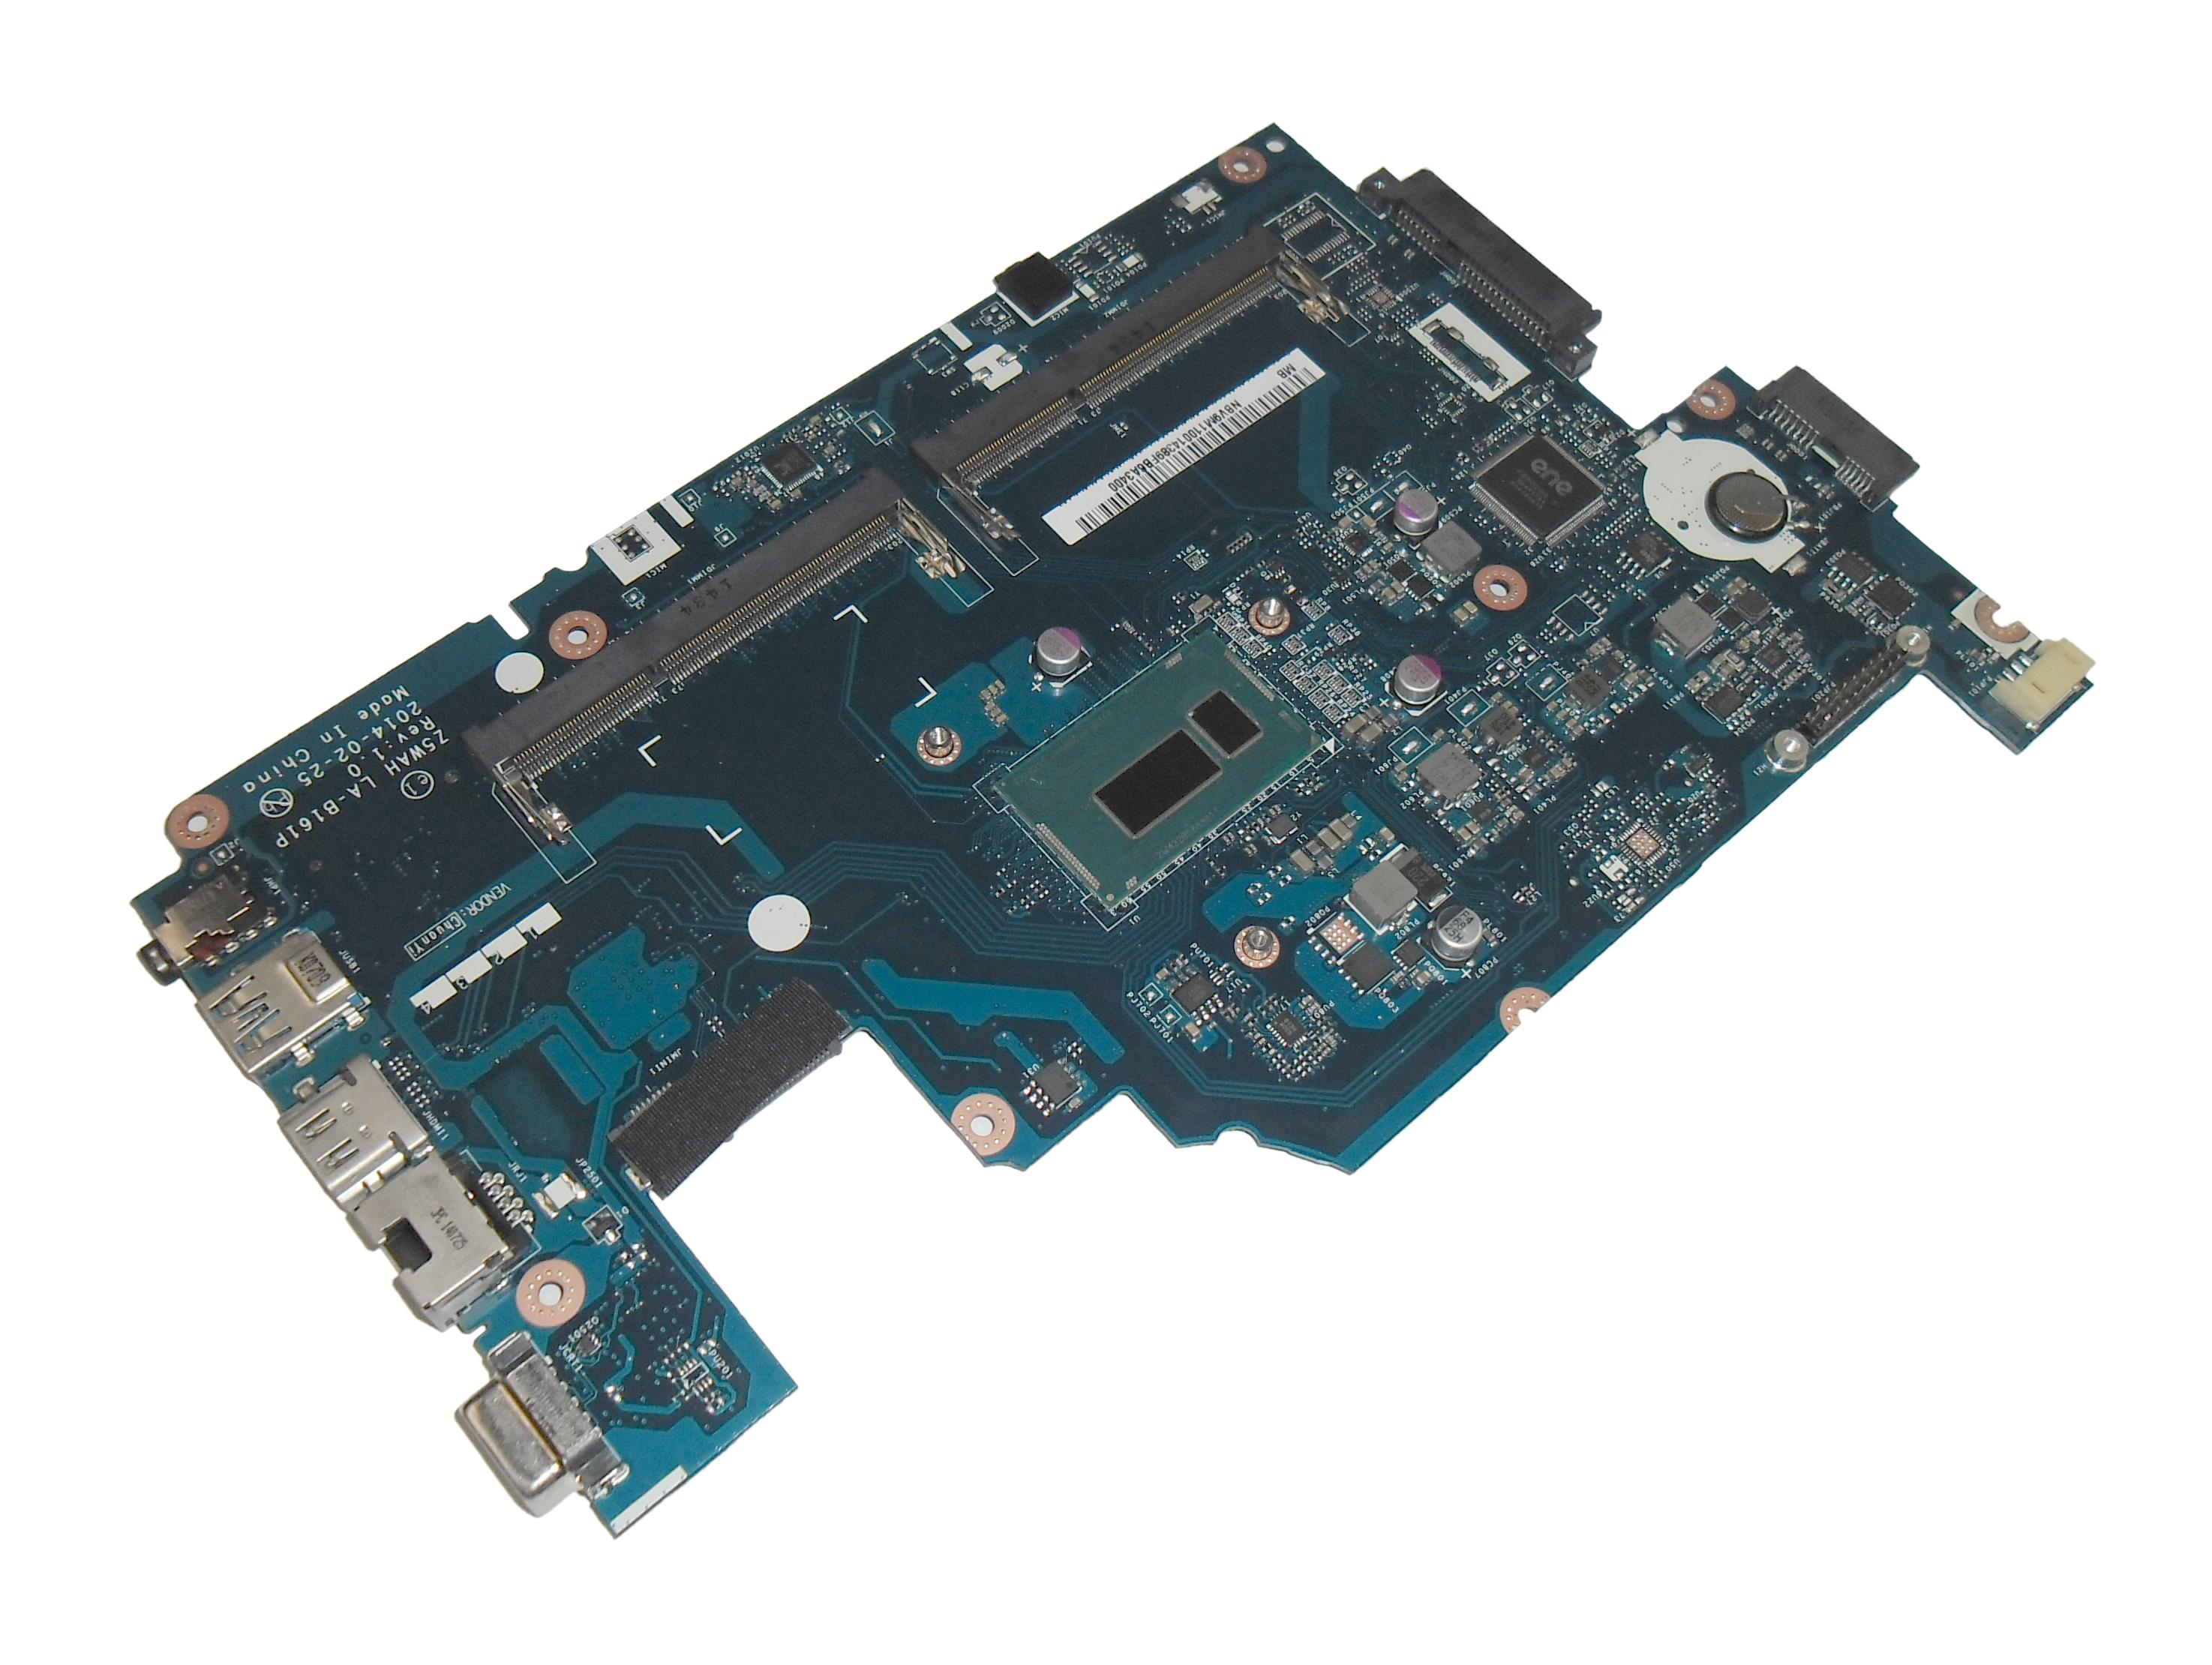 Acer NB.V9M11.001 Aspire E5-571 Motherboard with Intel i3-4005U CPU - LA-B161P